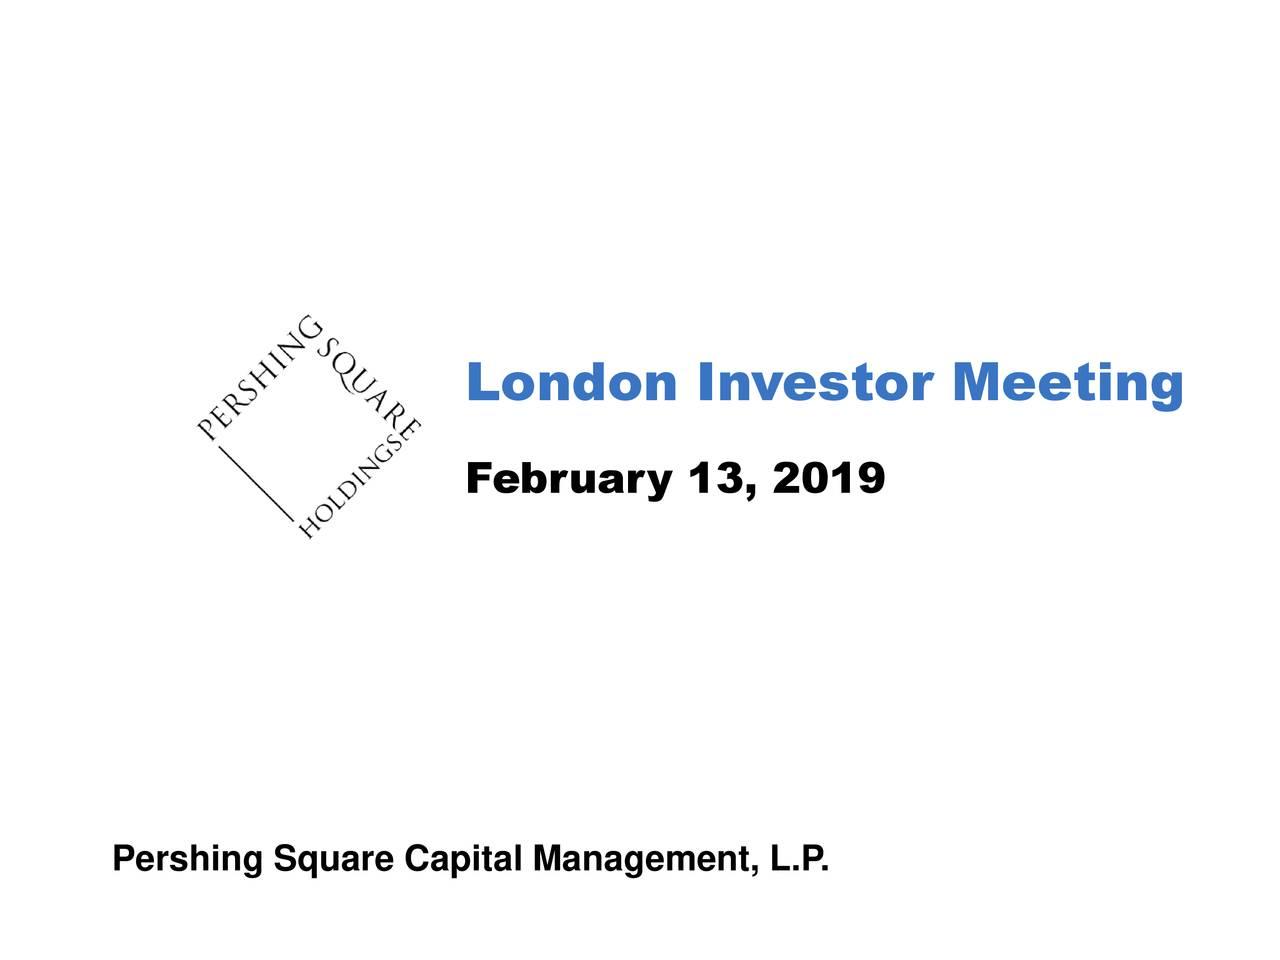 February 13, 2019 Pershing Square Capital Management, L.P.